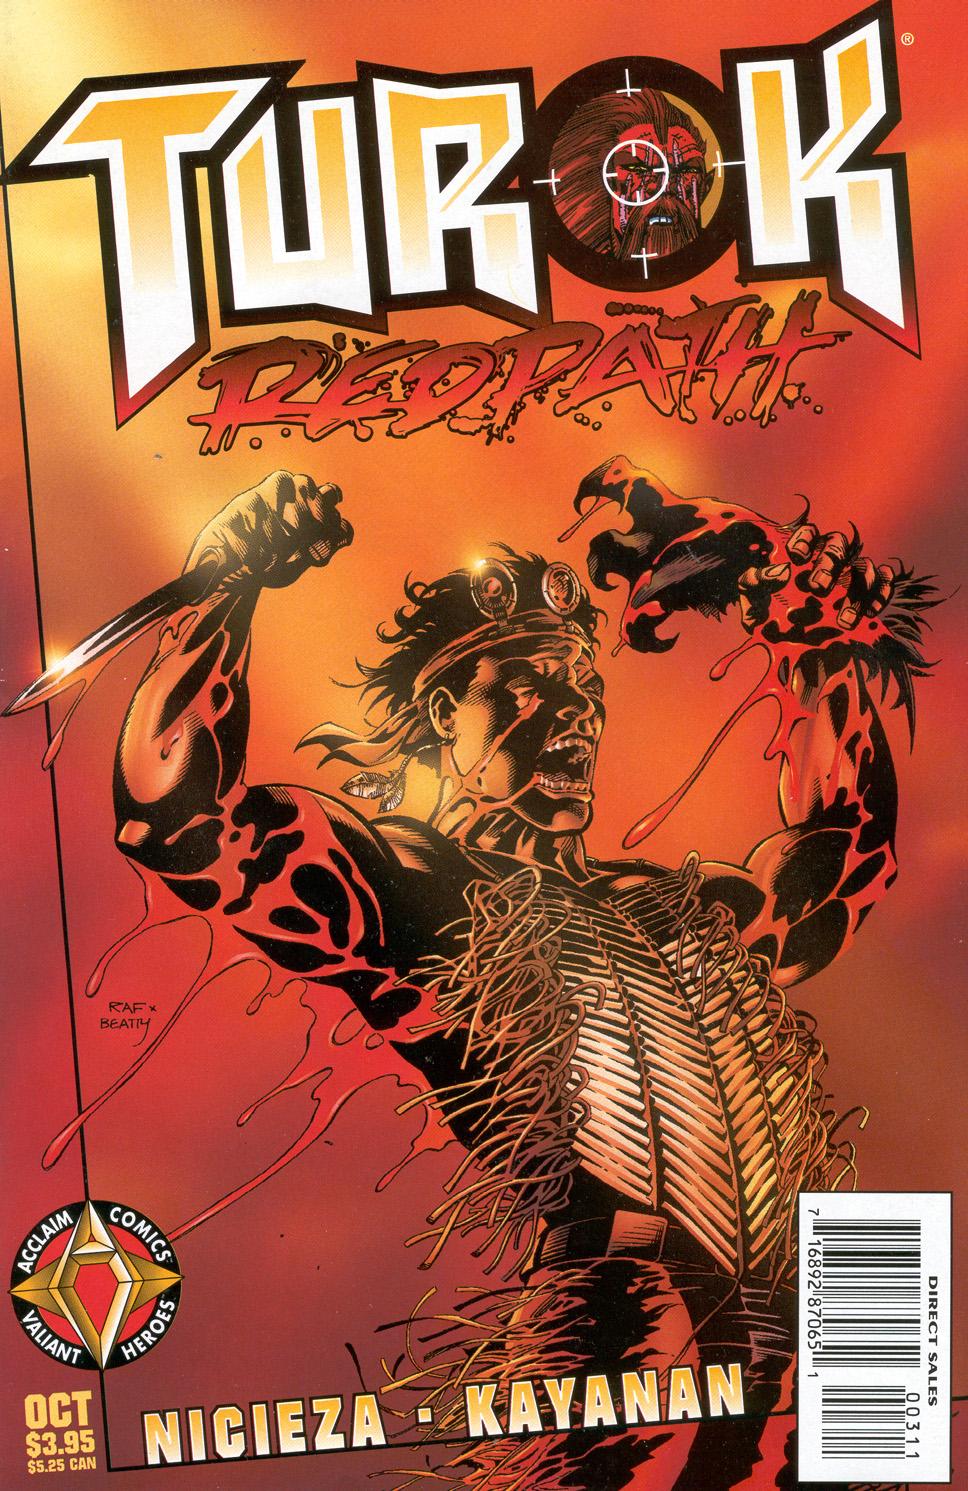 Read online Turok: Redpath comic -  Issue # Full - 1